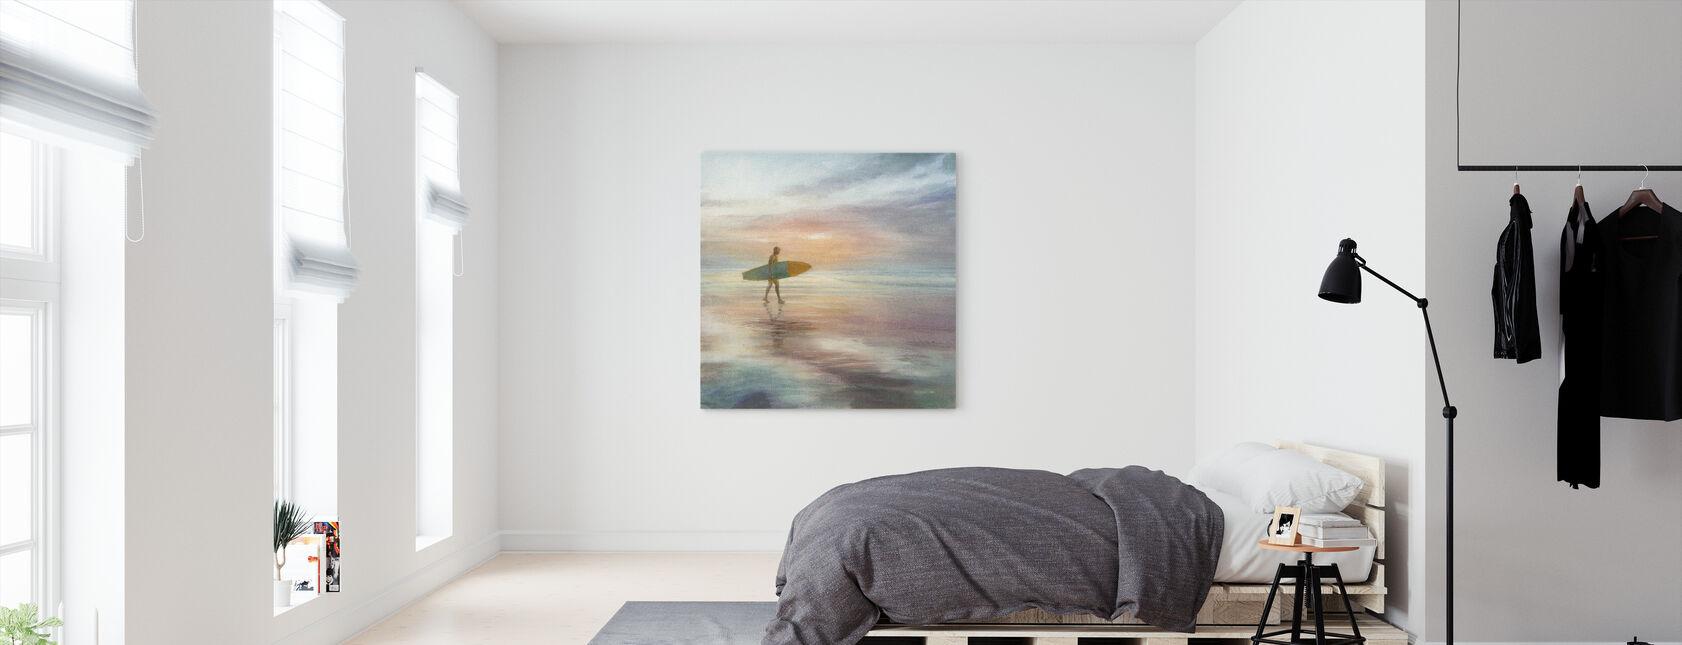 Surfside - Canvas print - Bedroom